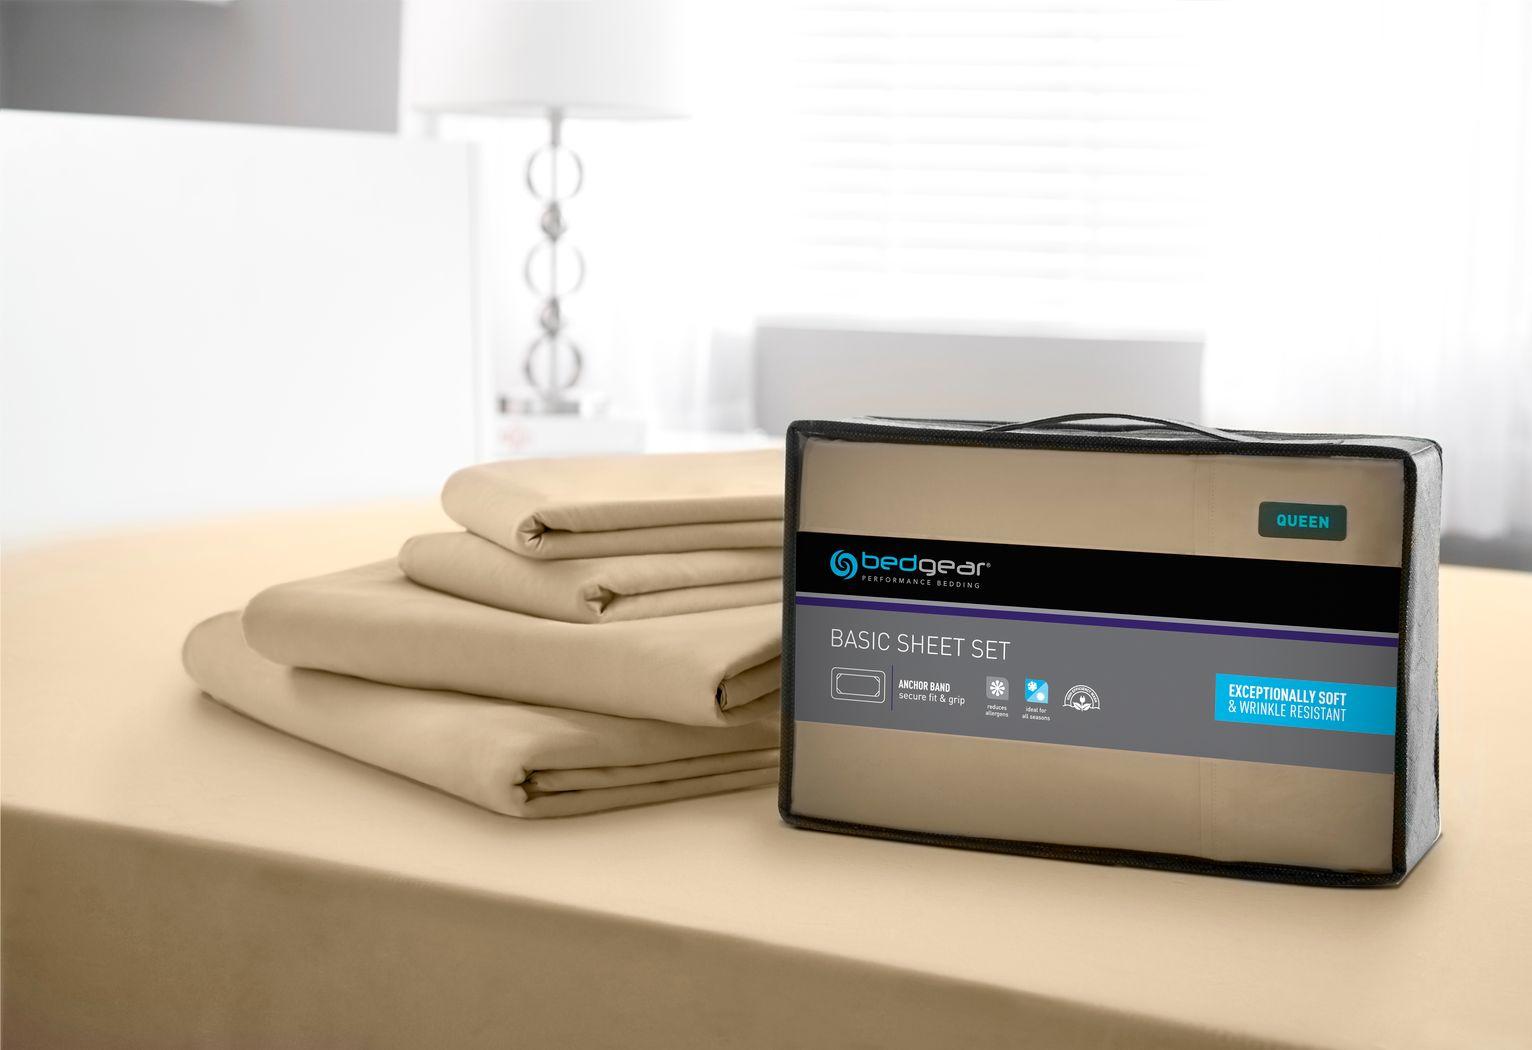 BG Basic Sand 4 Pc Queen Bed Sheet Set